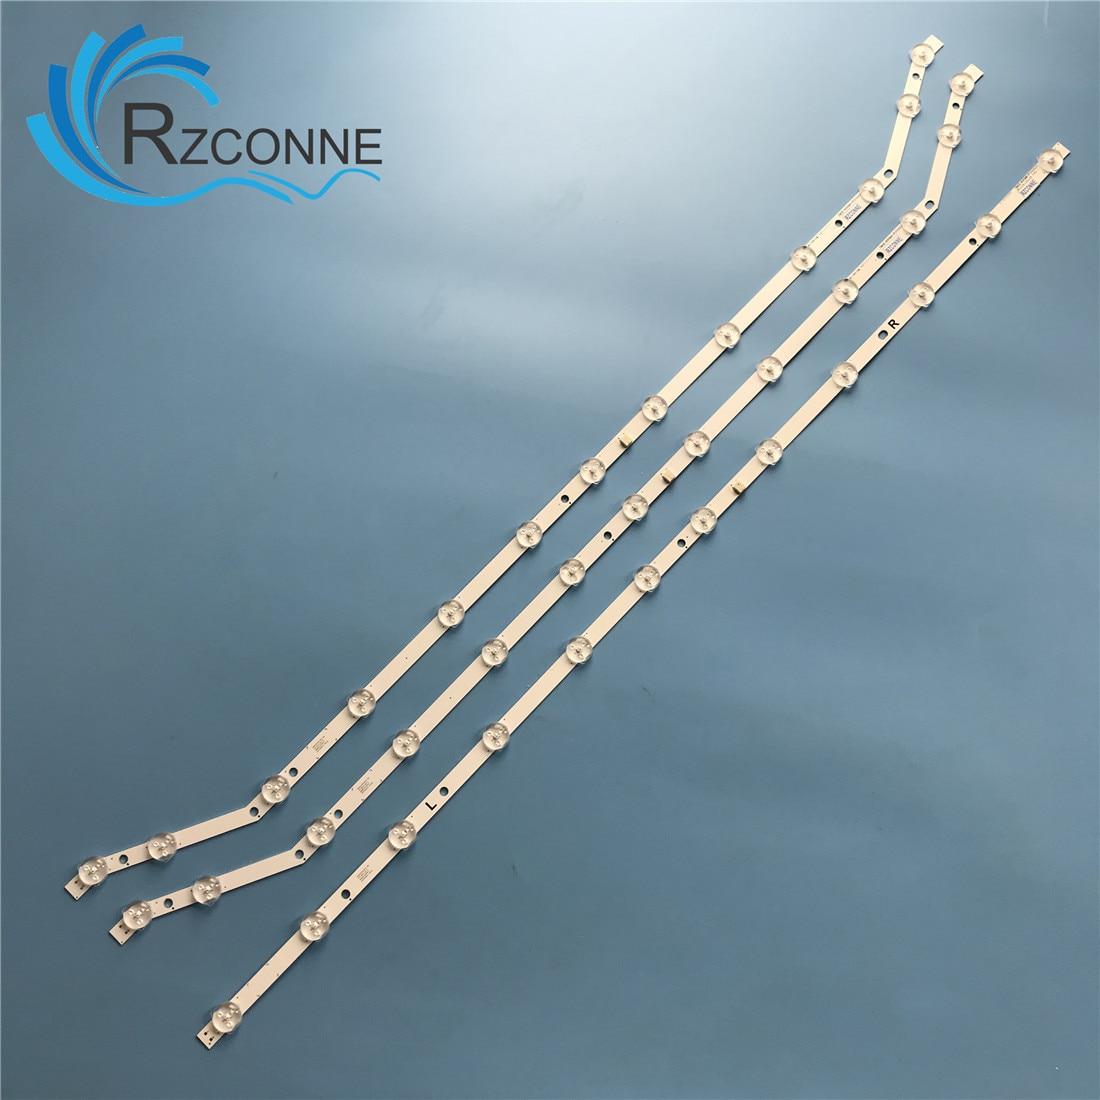 led-backlight-strip-for-hg40ac460-lm41-00090x-lm41-00090y-2014svs_40-cy-hh040aglv1v-dmge-400sma-r0-dmge-400smb-r0-lh40ebdwlgd